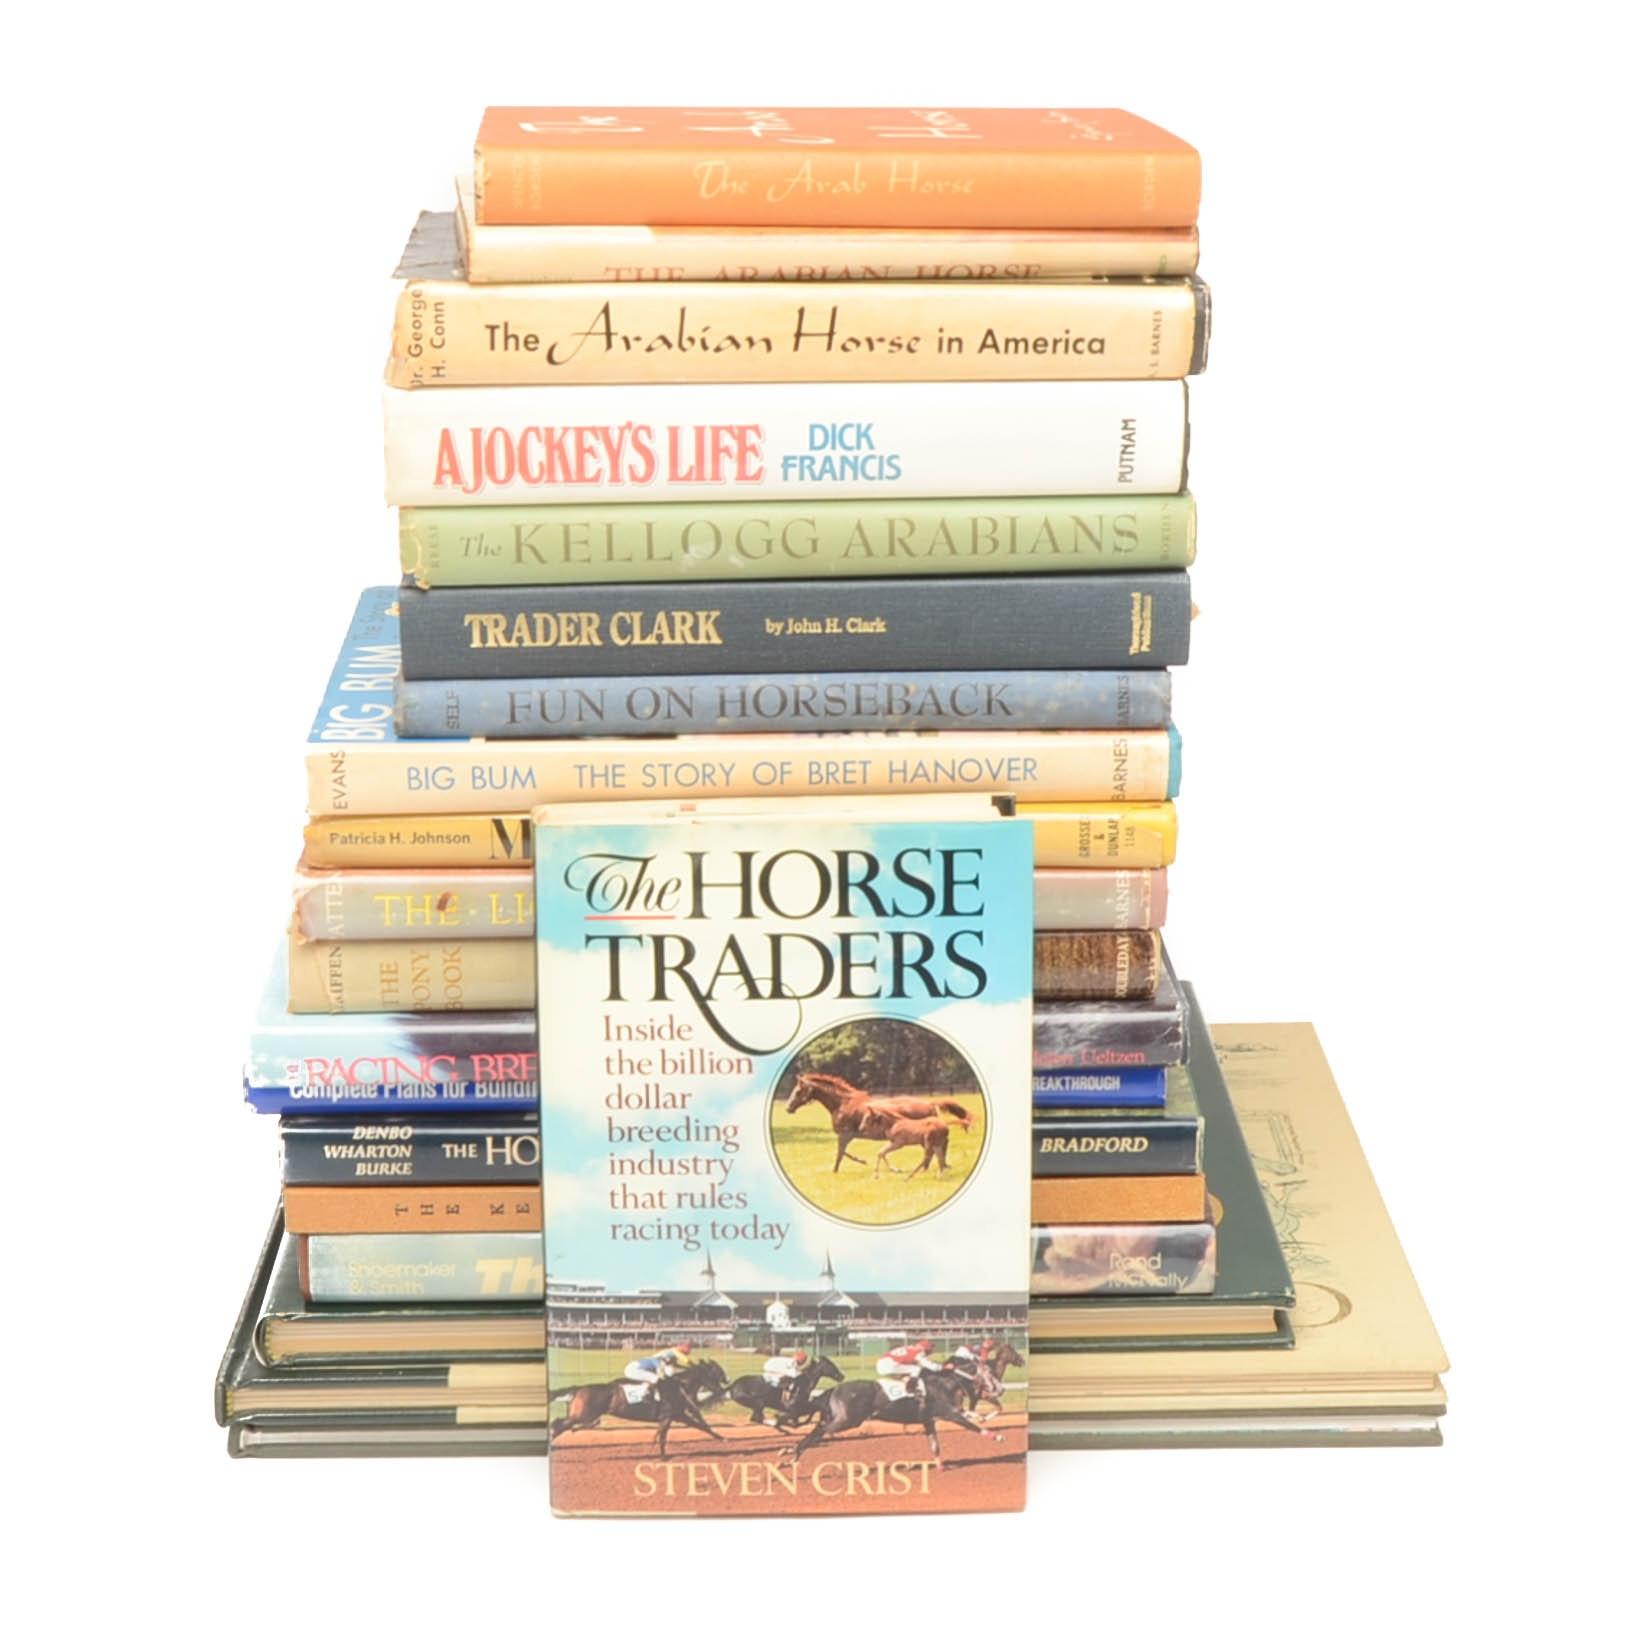 Horse Themed Books From Cawood Ledford Estate